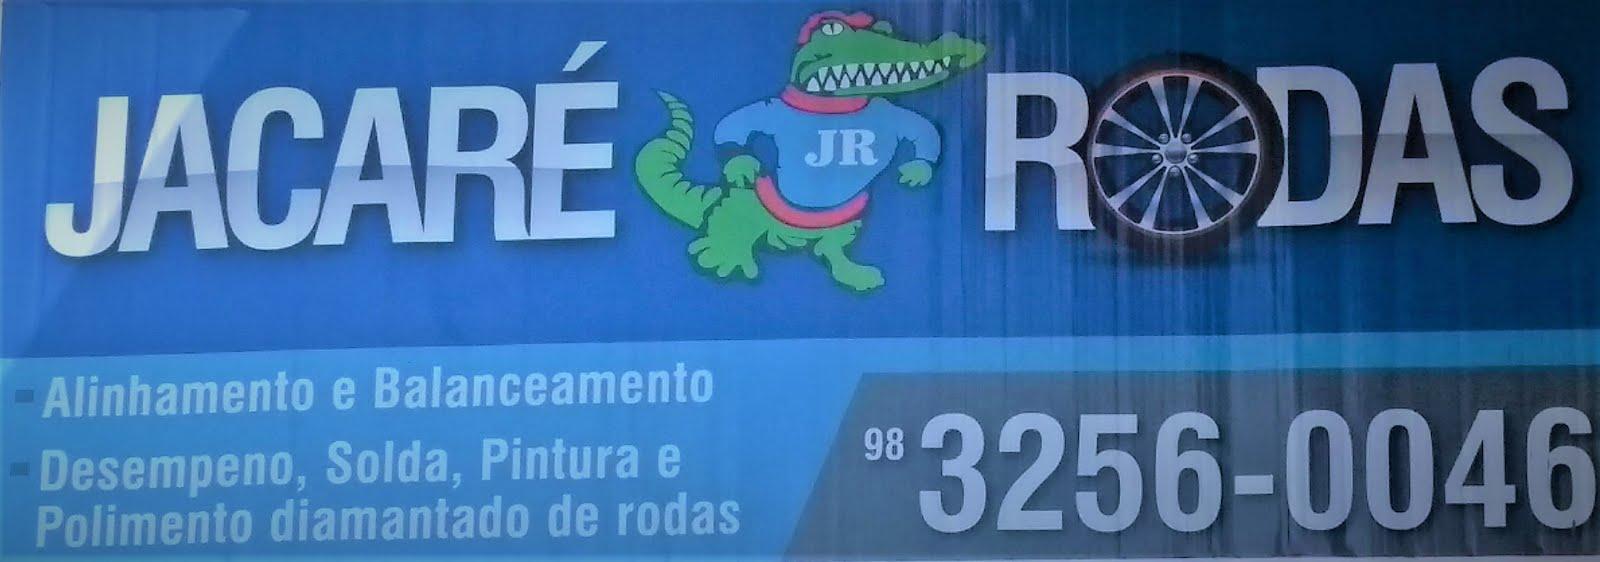 JACARÉ RODAS - CURVA DOS NOVENTA